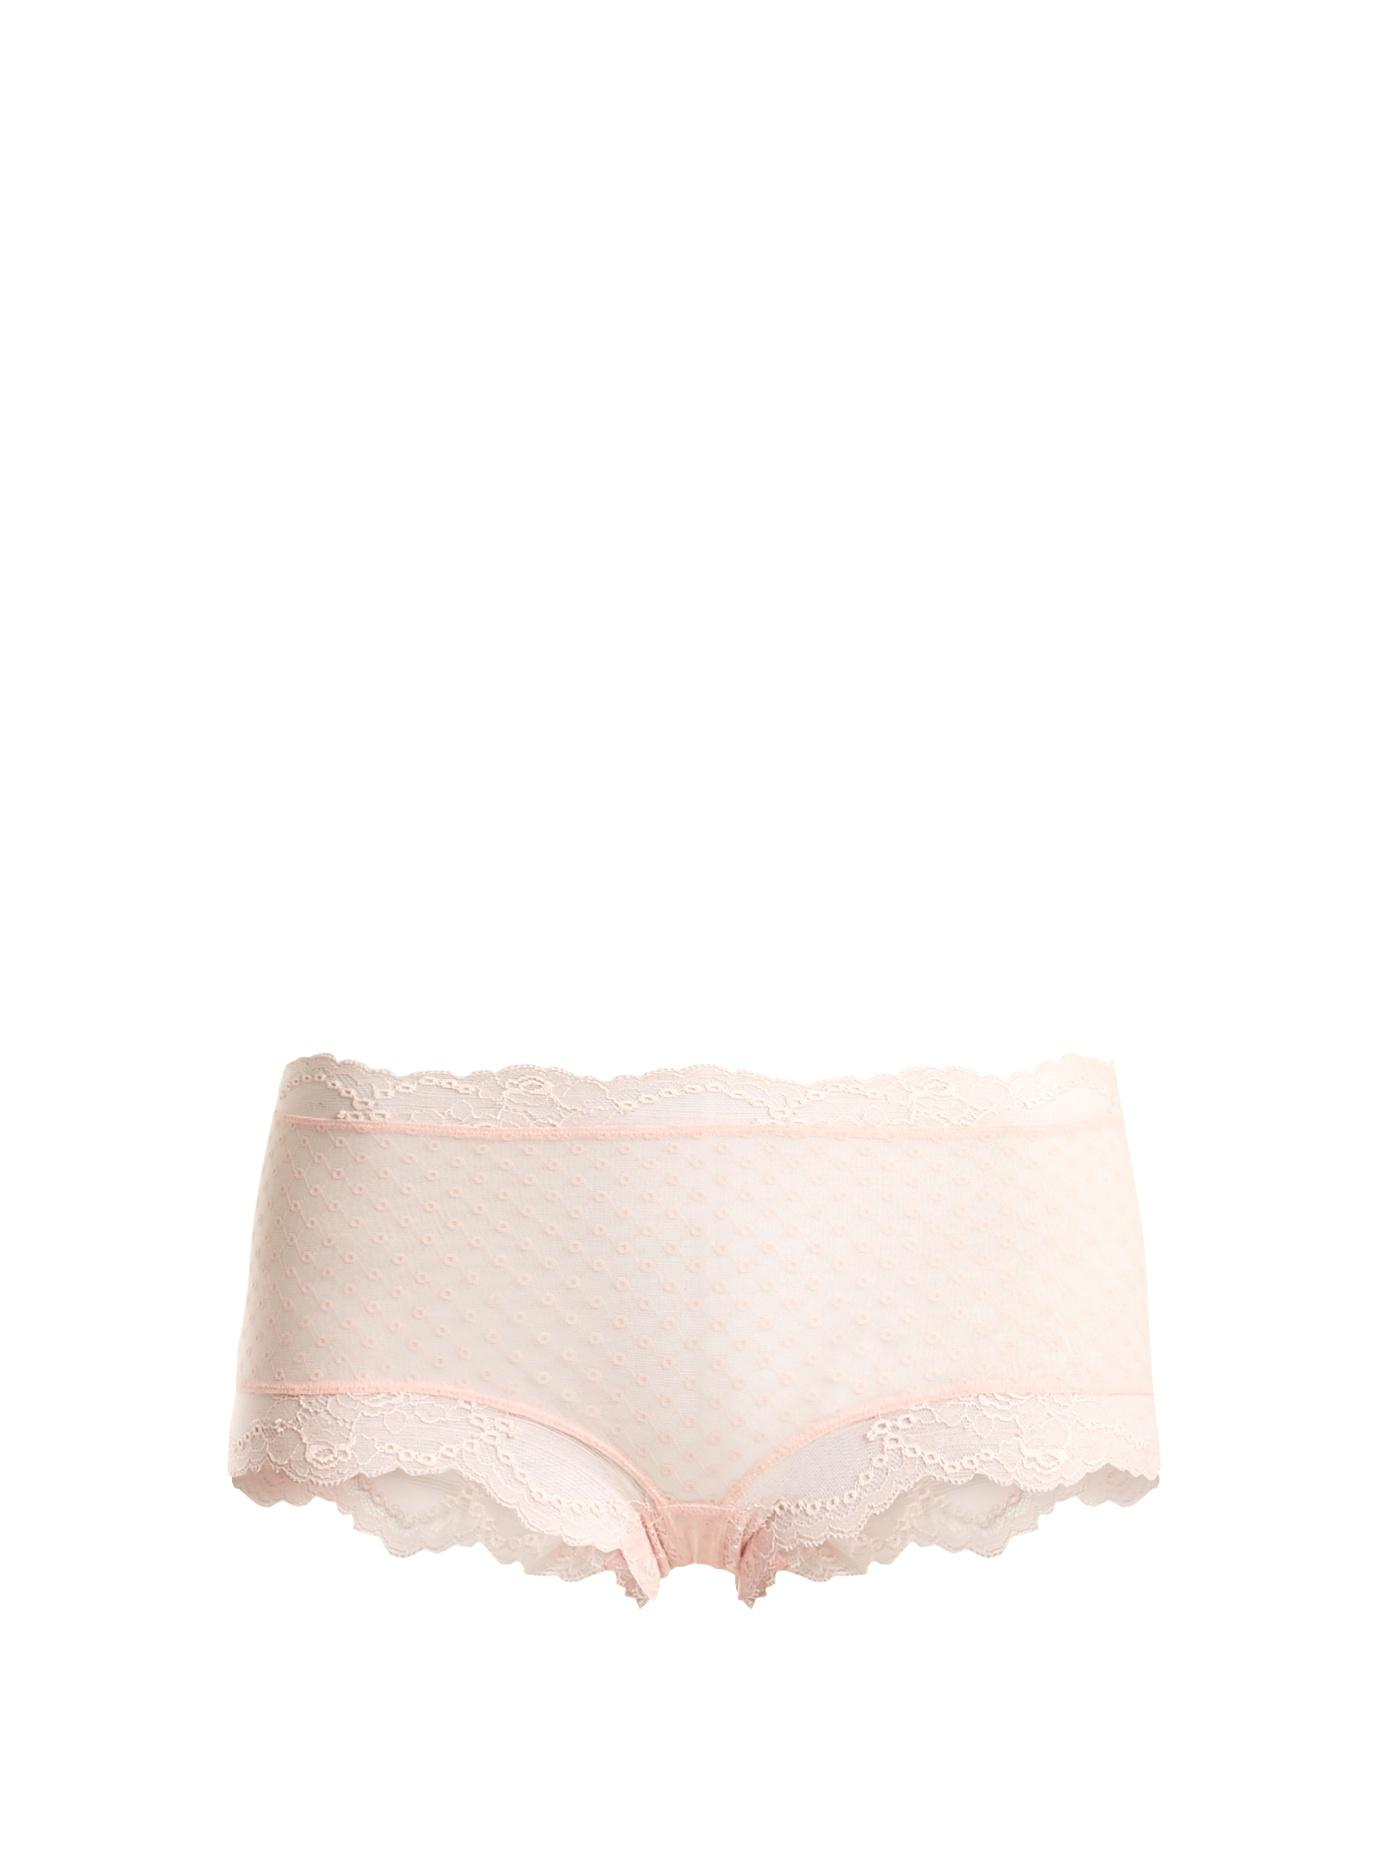 La Perla Tuberose Lace Boy-Short Briefs In Light Pink